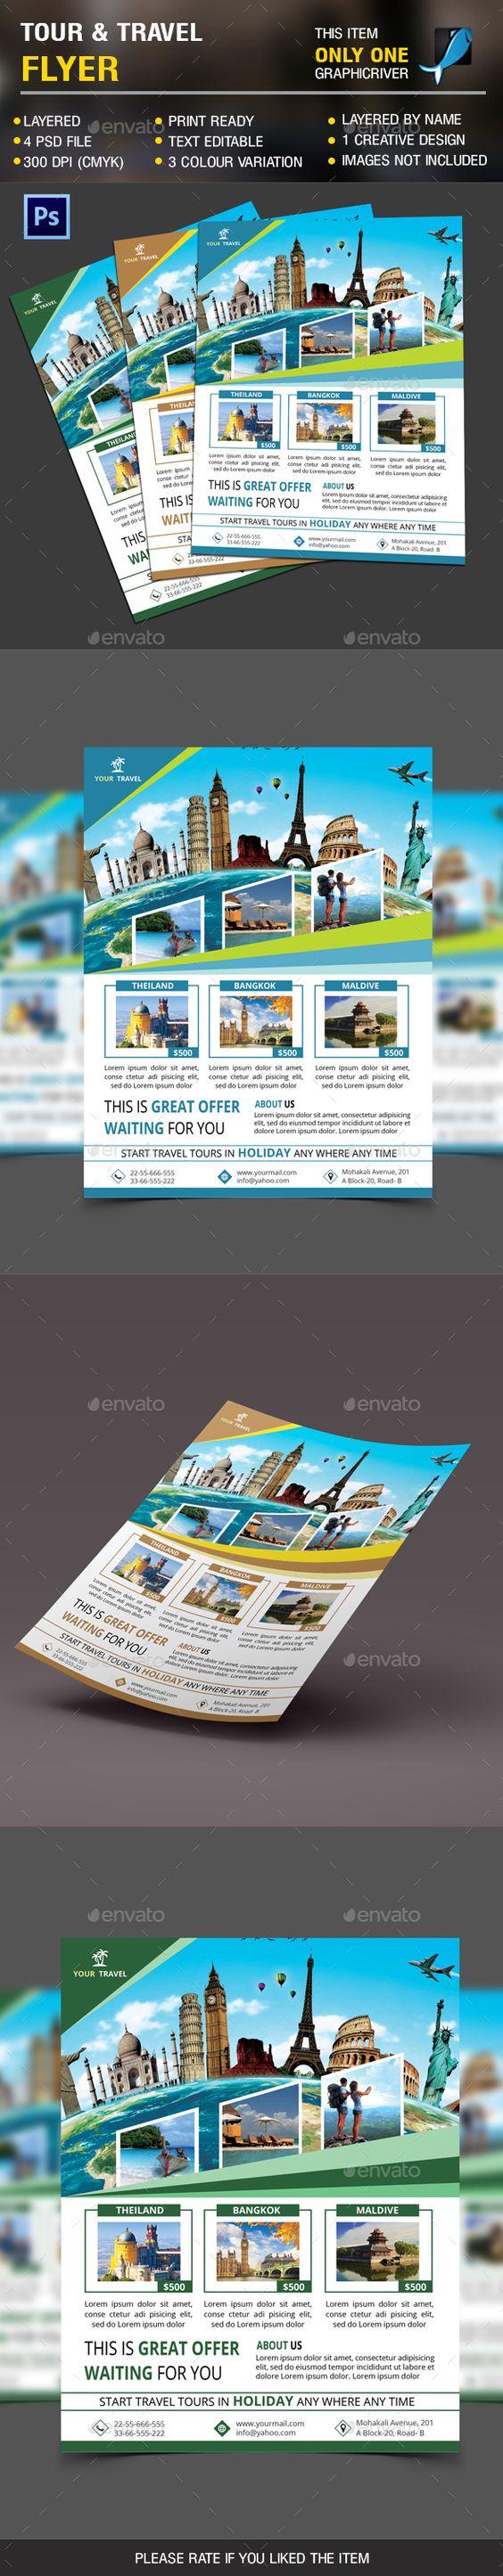 holiday travel flyer vol holiday travel vol and flyer template holiday travel flyer template psd design graphicriver net